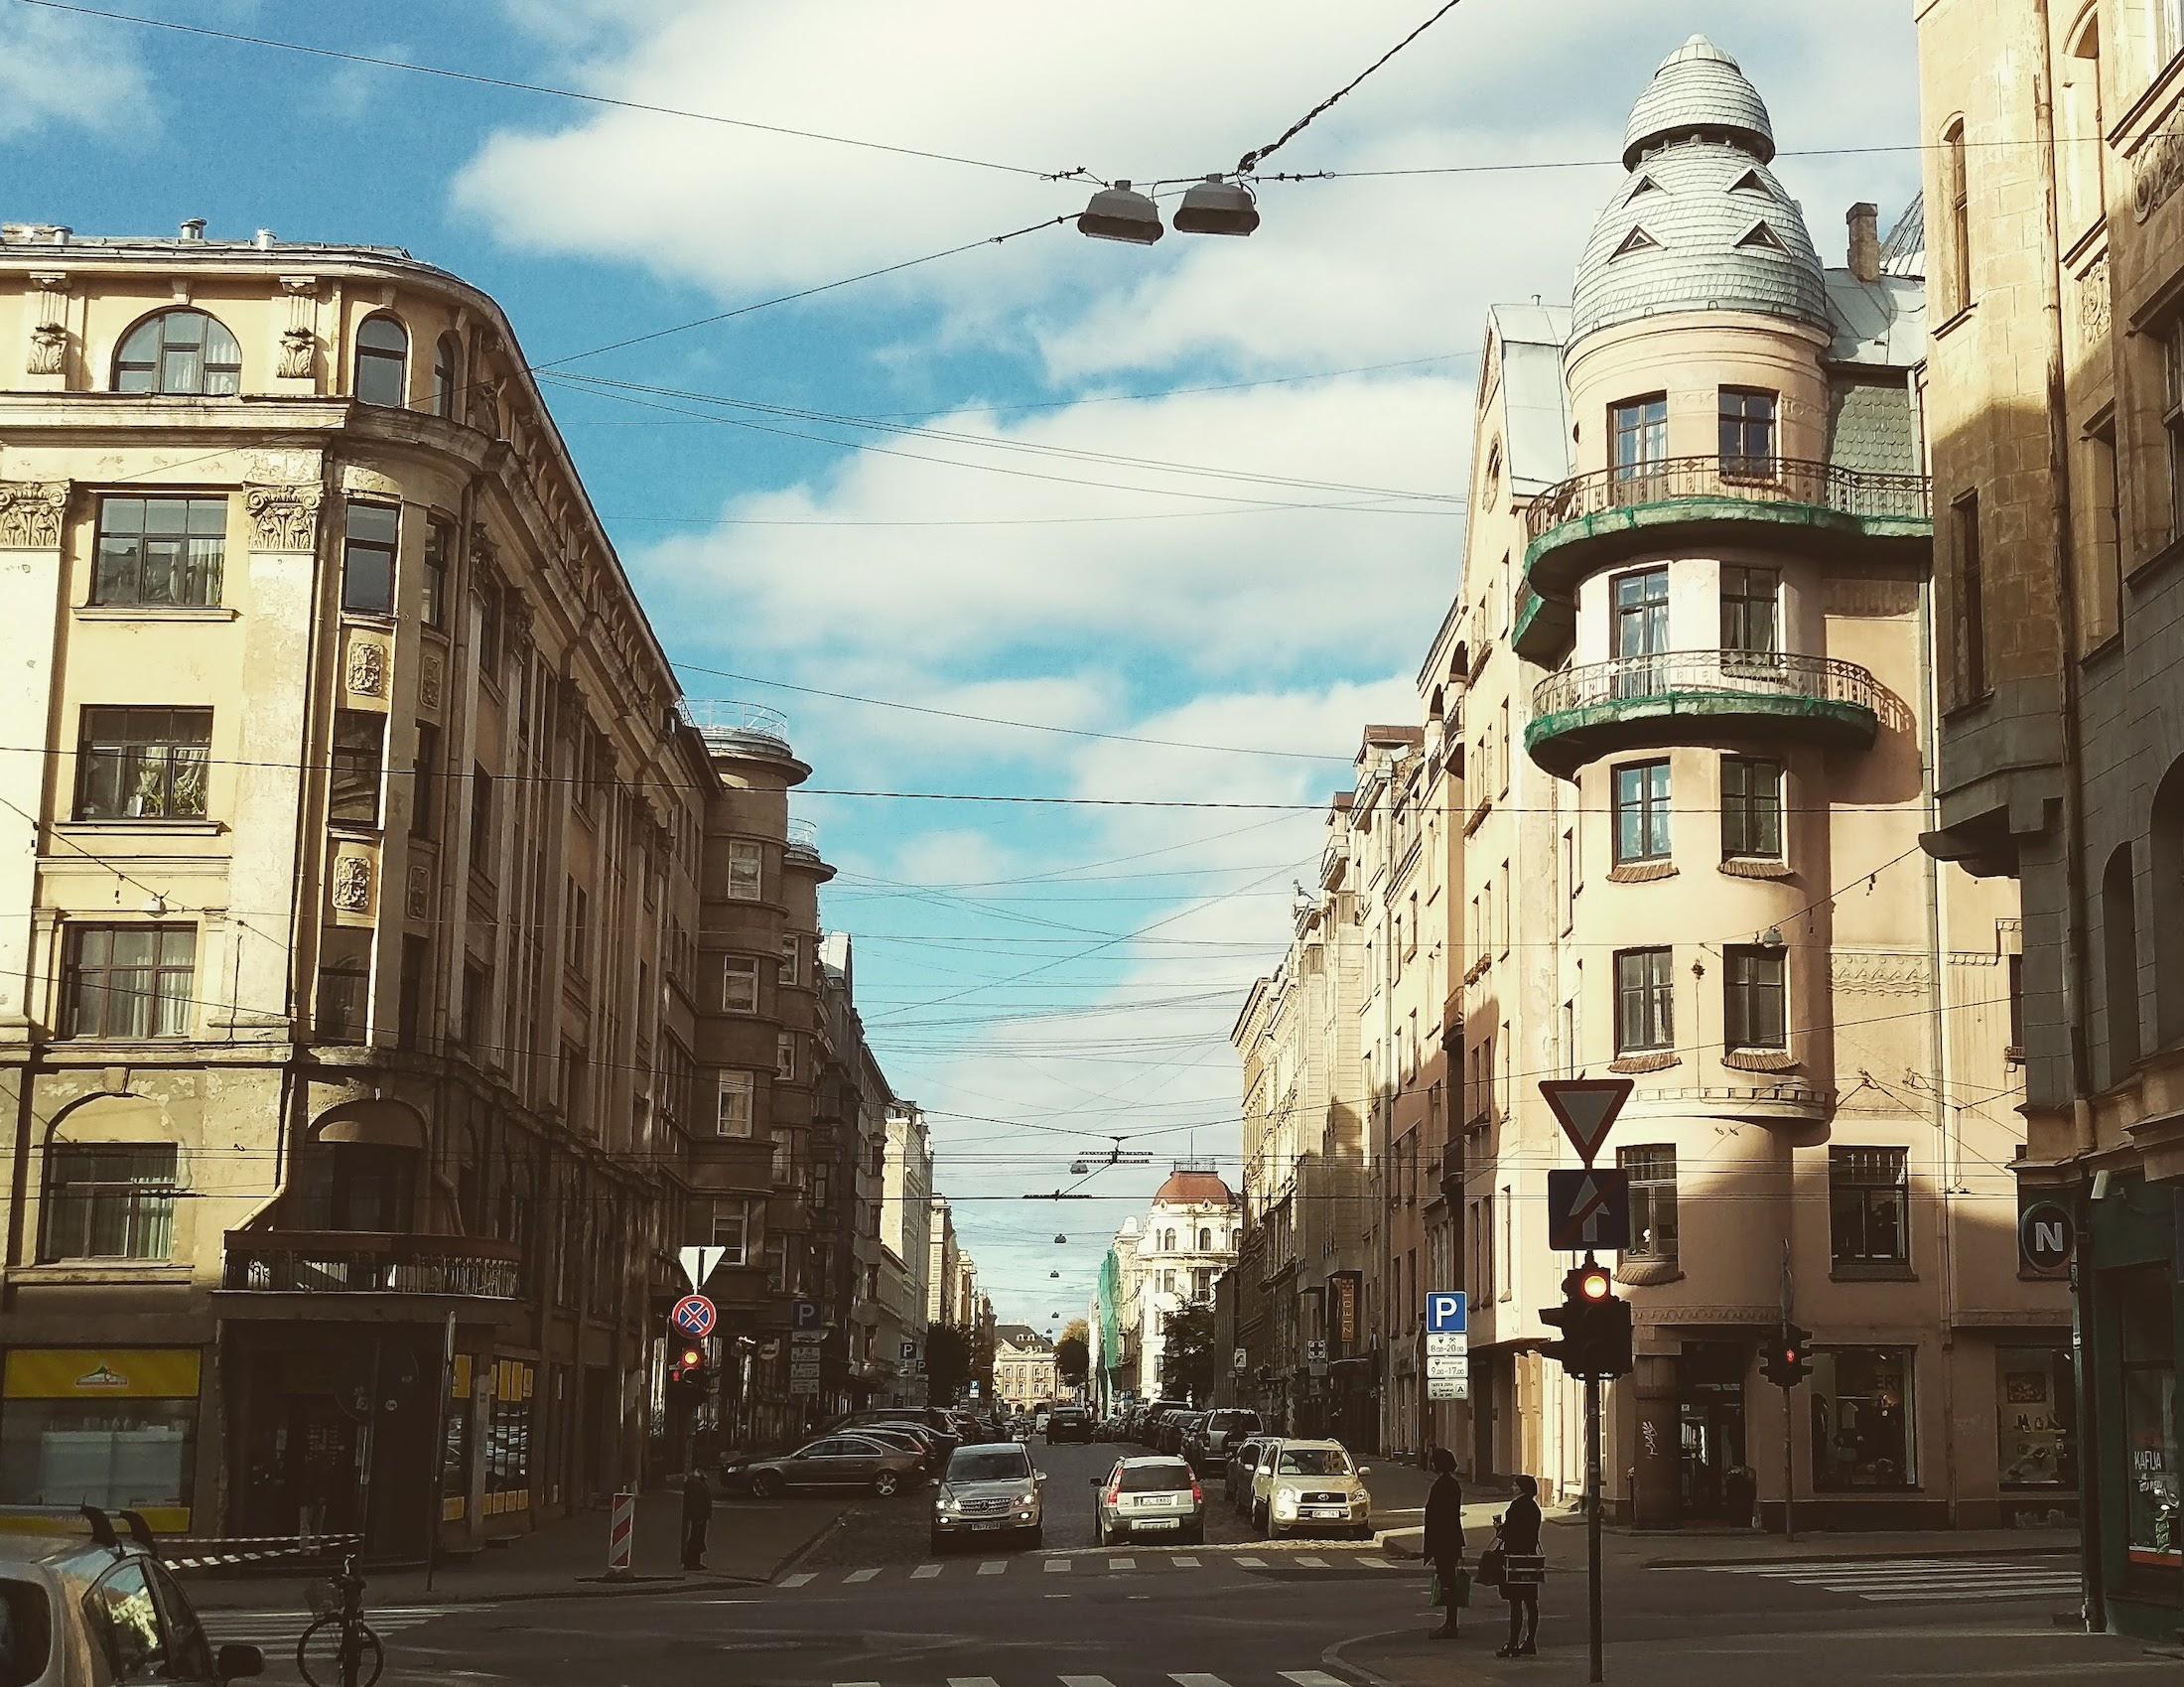 Corner of Blaumaņa and Čaka Street - Border of Avoti neighborhood